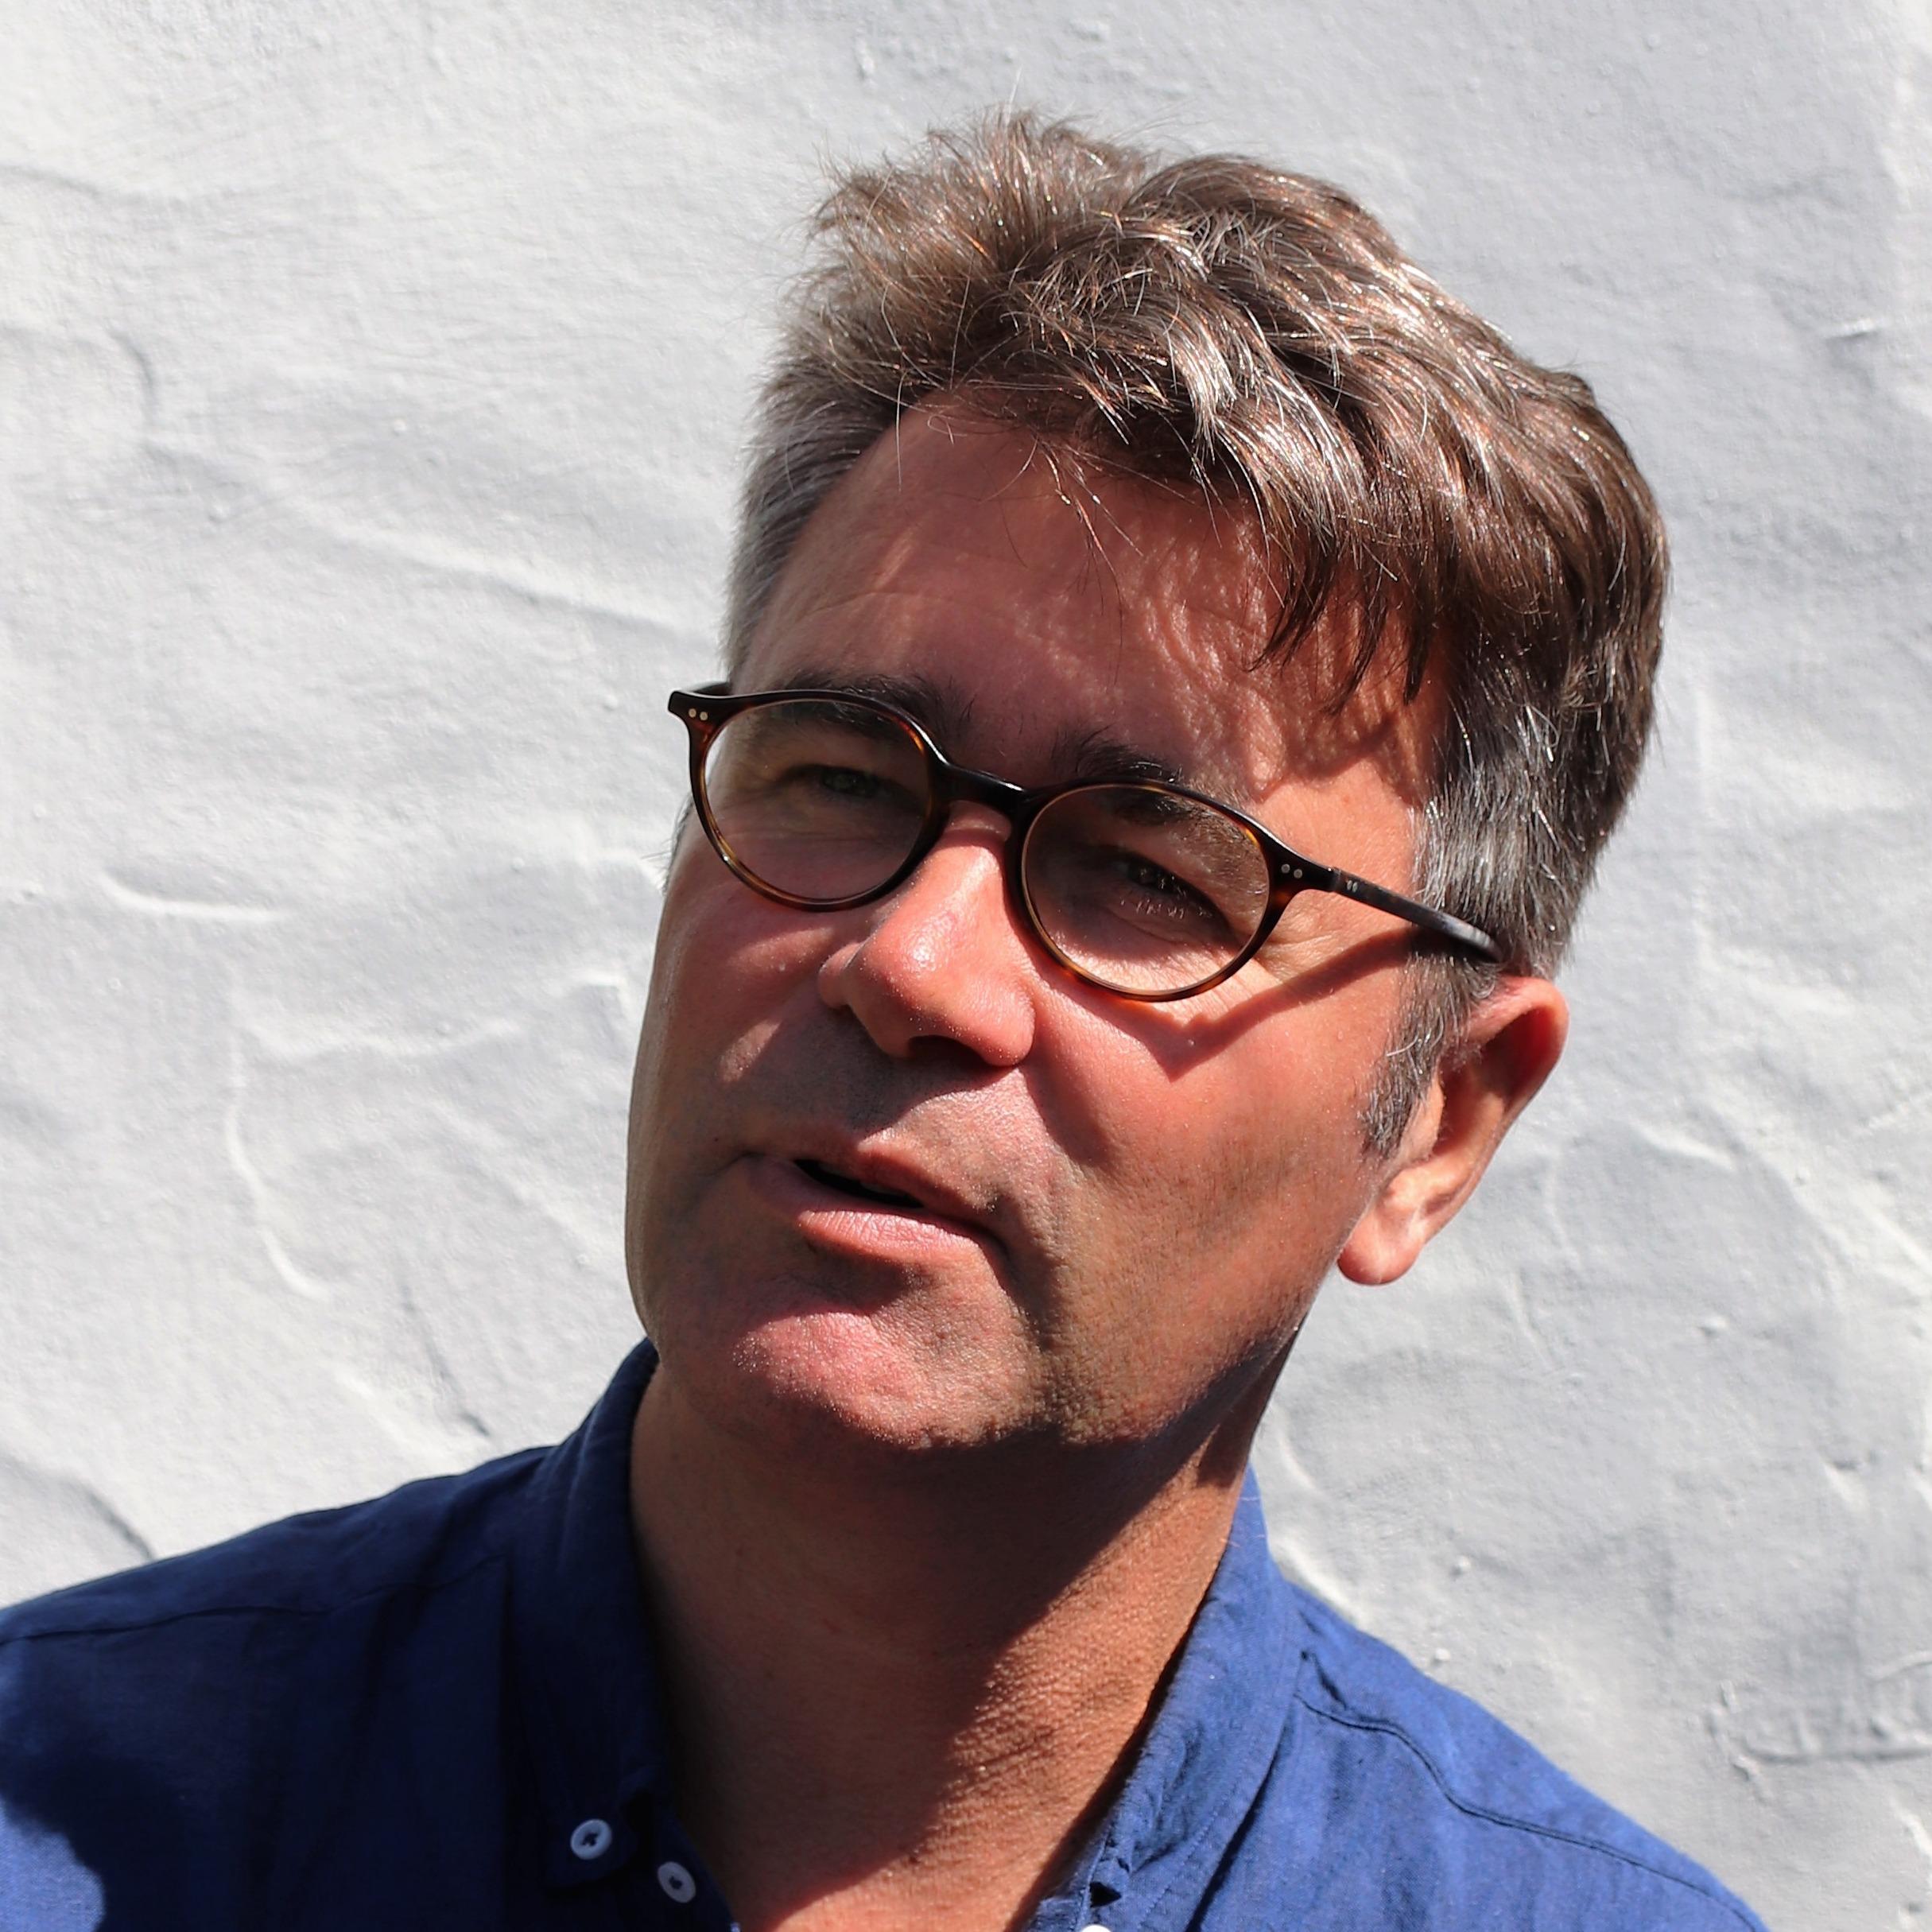 Jean-François Boisson